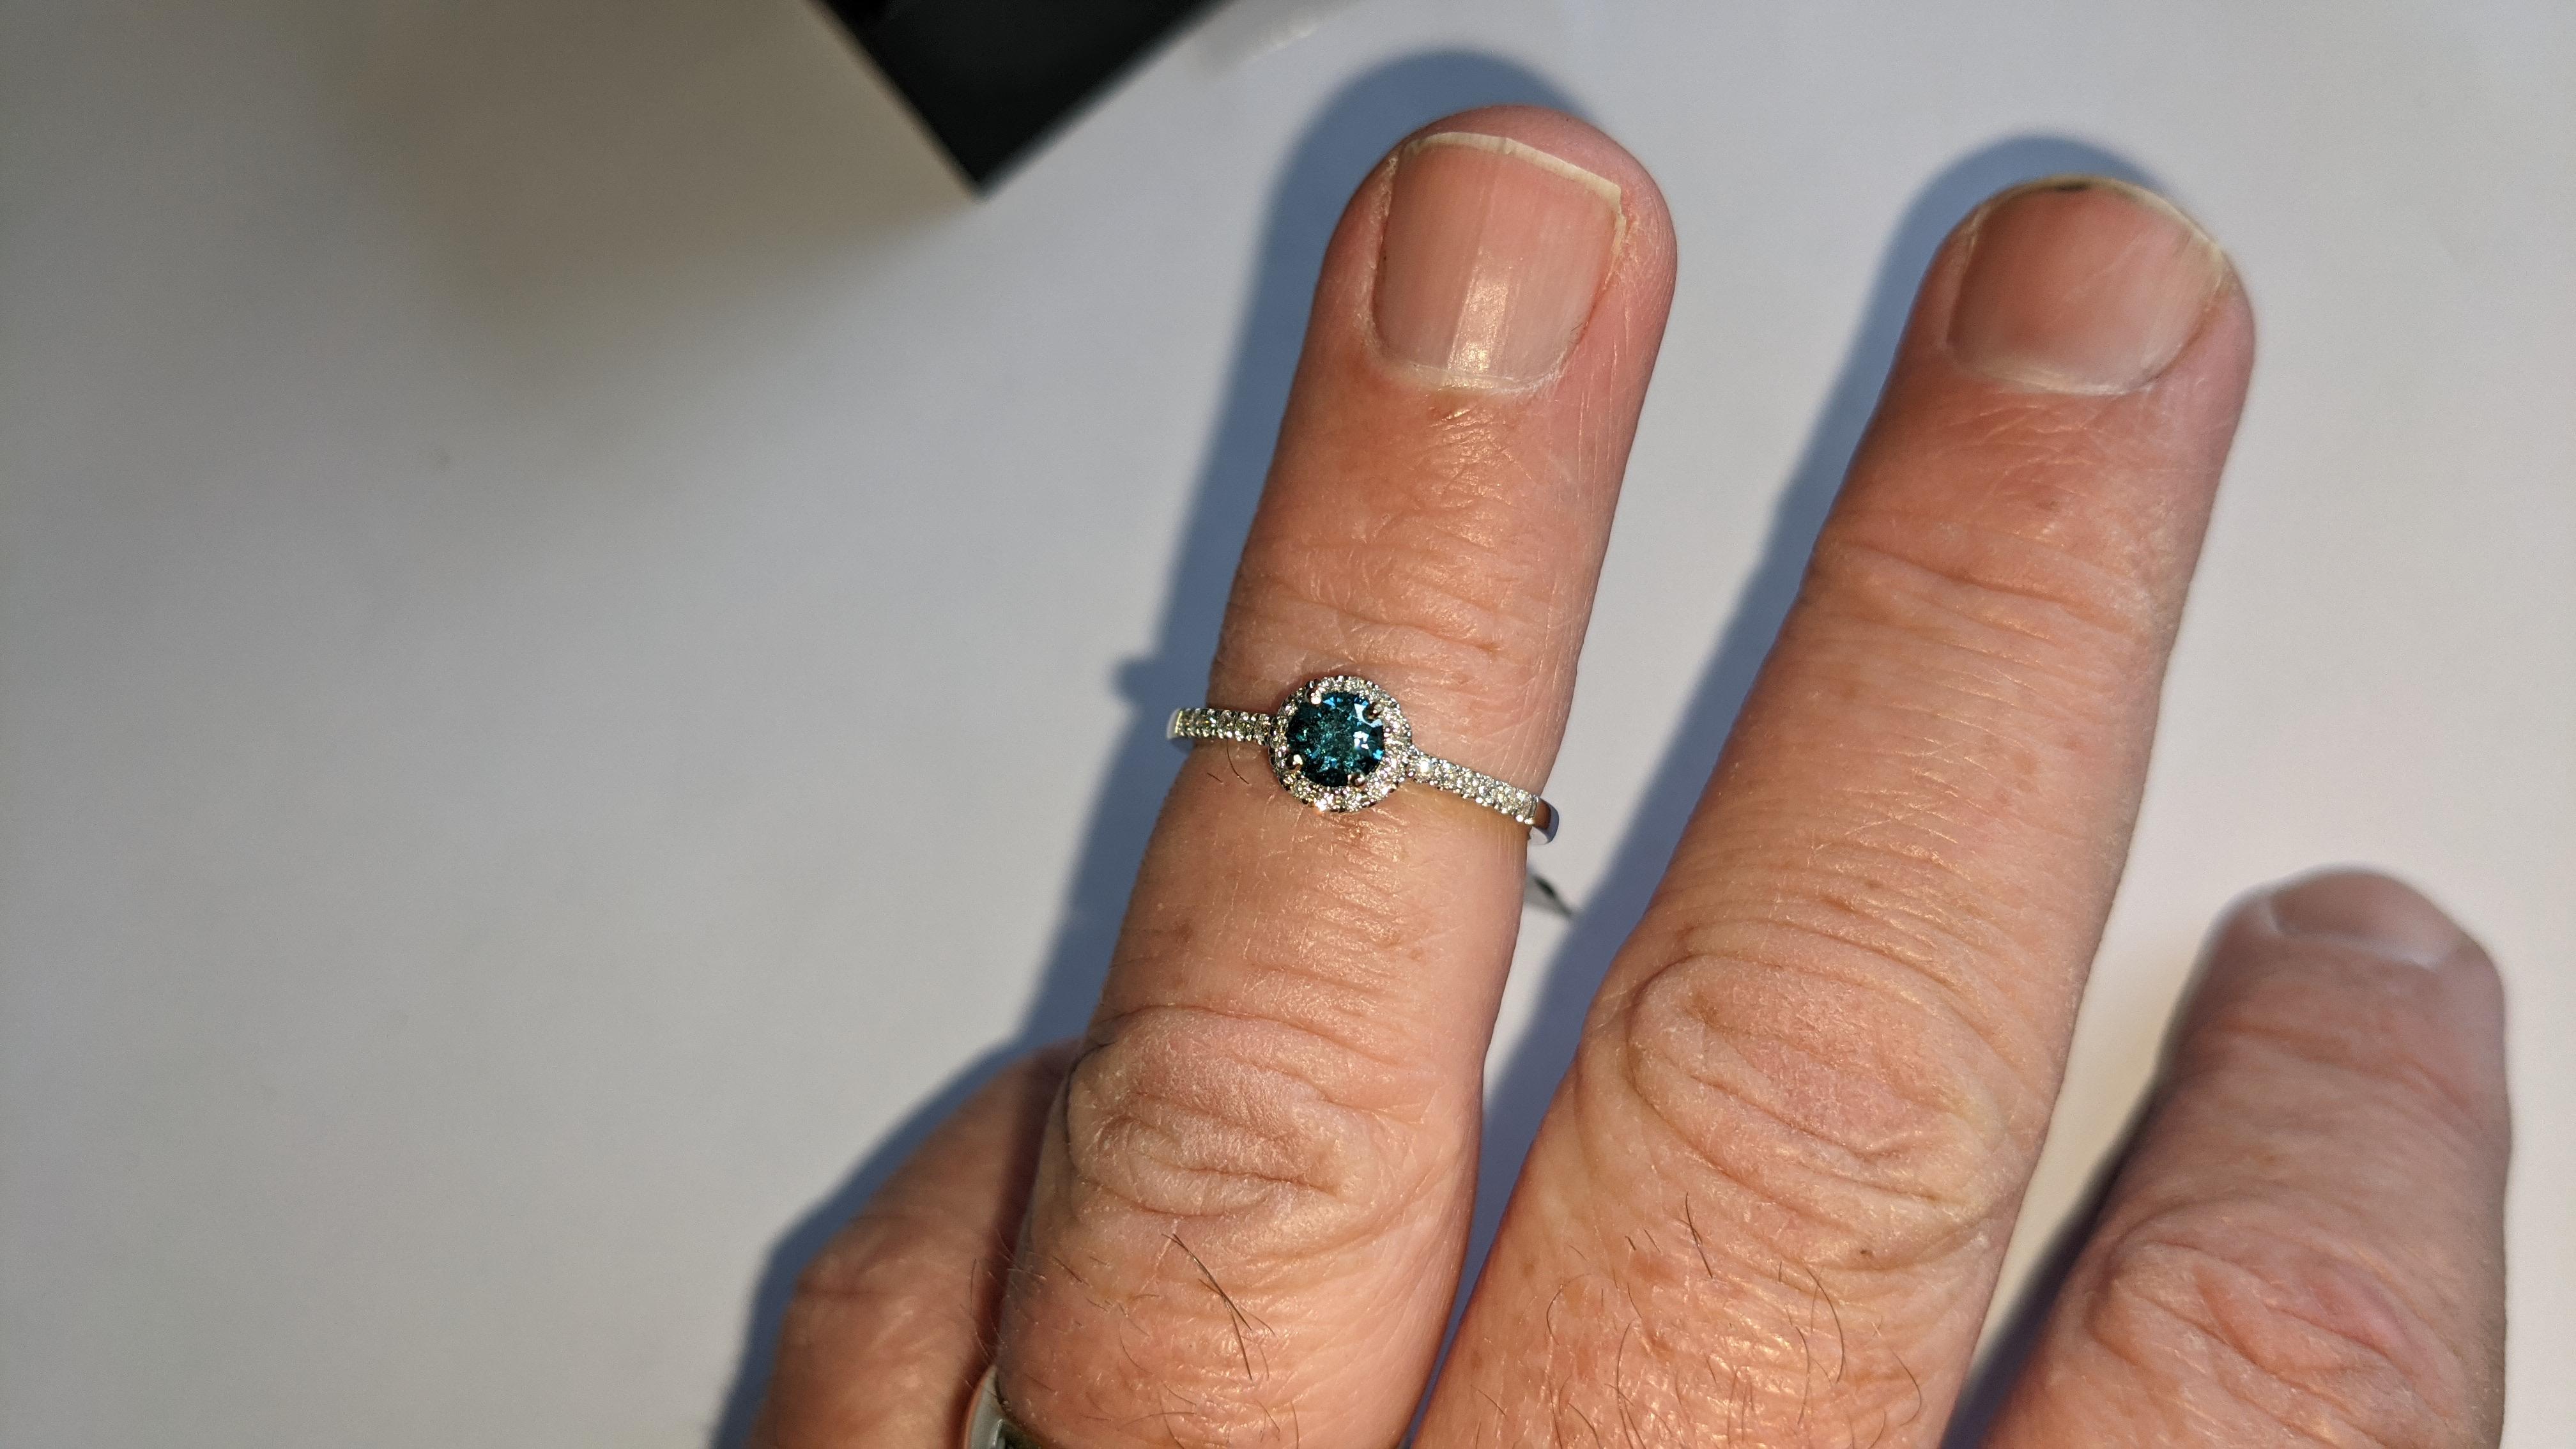 18ct white gold & diamond ring with 0.30ct blue diamond & 0.1ct of additional diamonds around the ce - Image 18 of 19